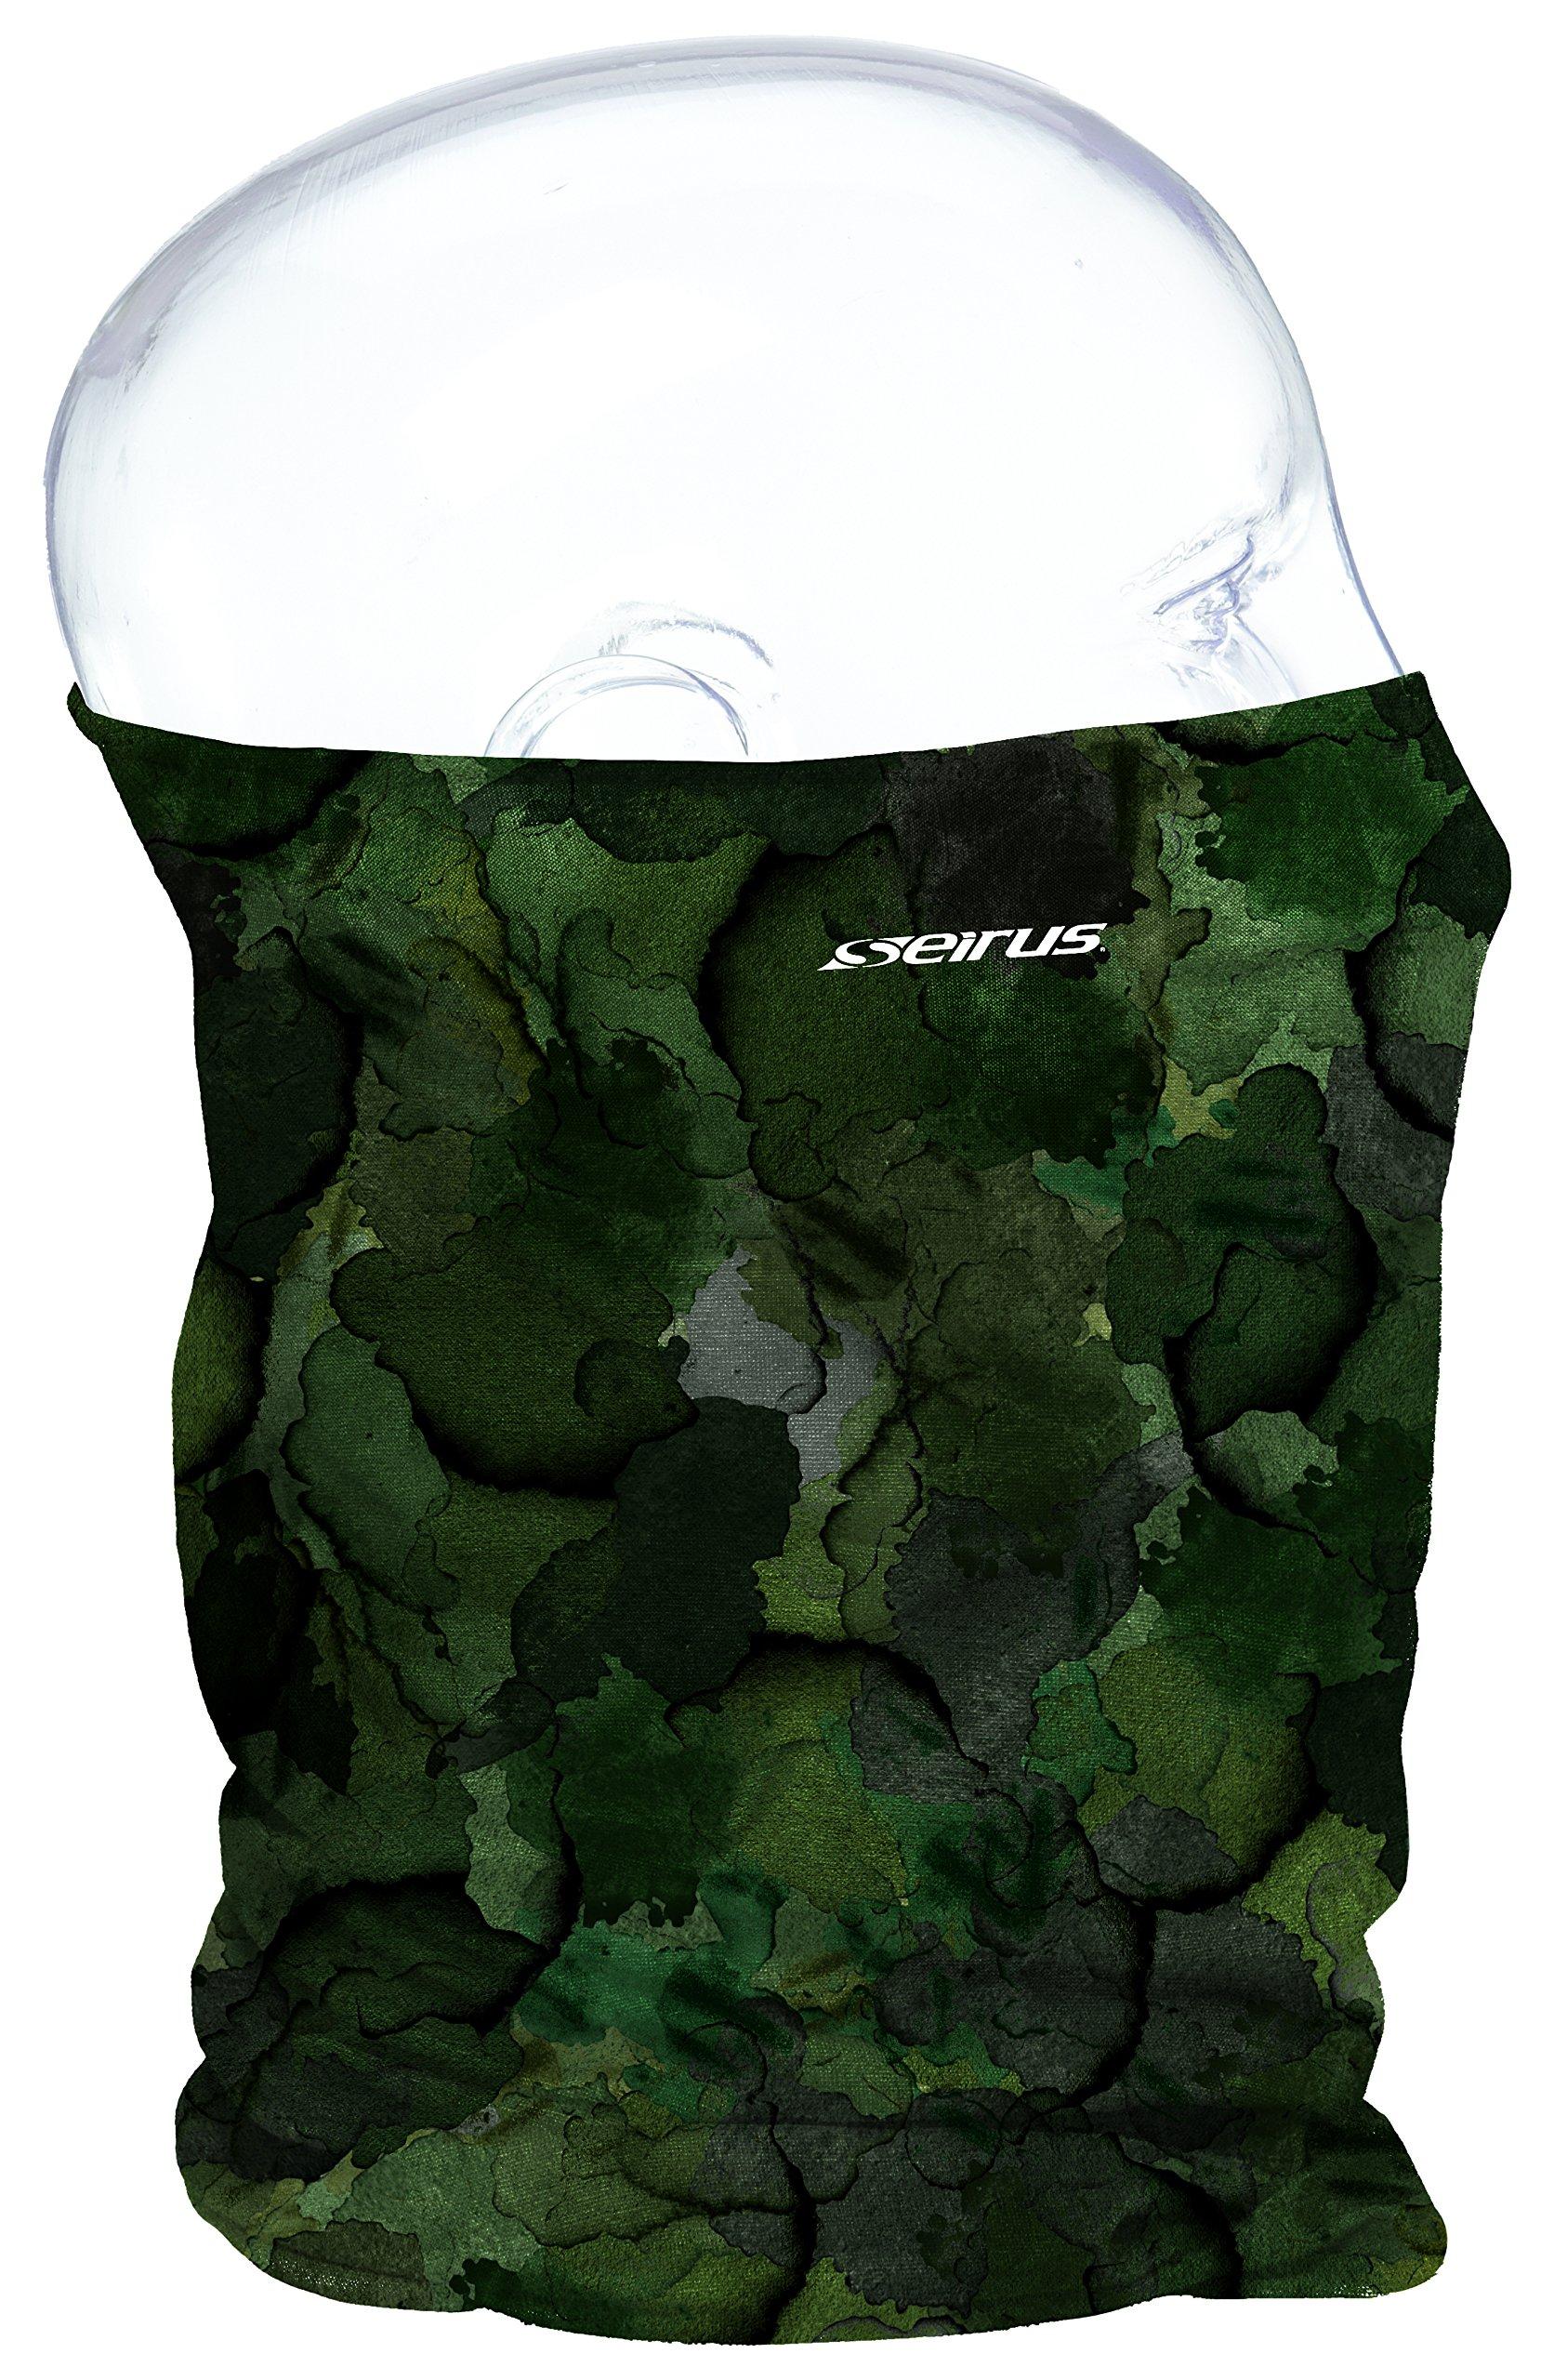 Seirus Innovation Snowthing Uv Sun Protection Plus Fleece Lining Neck Gaiter, Olive, One Size